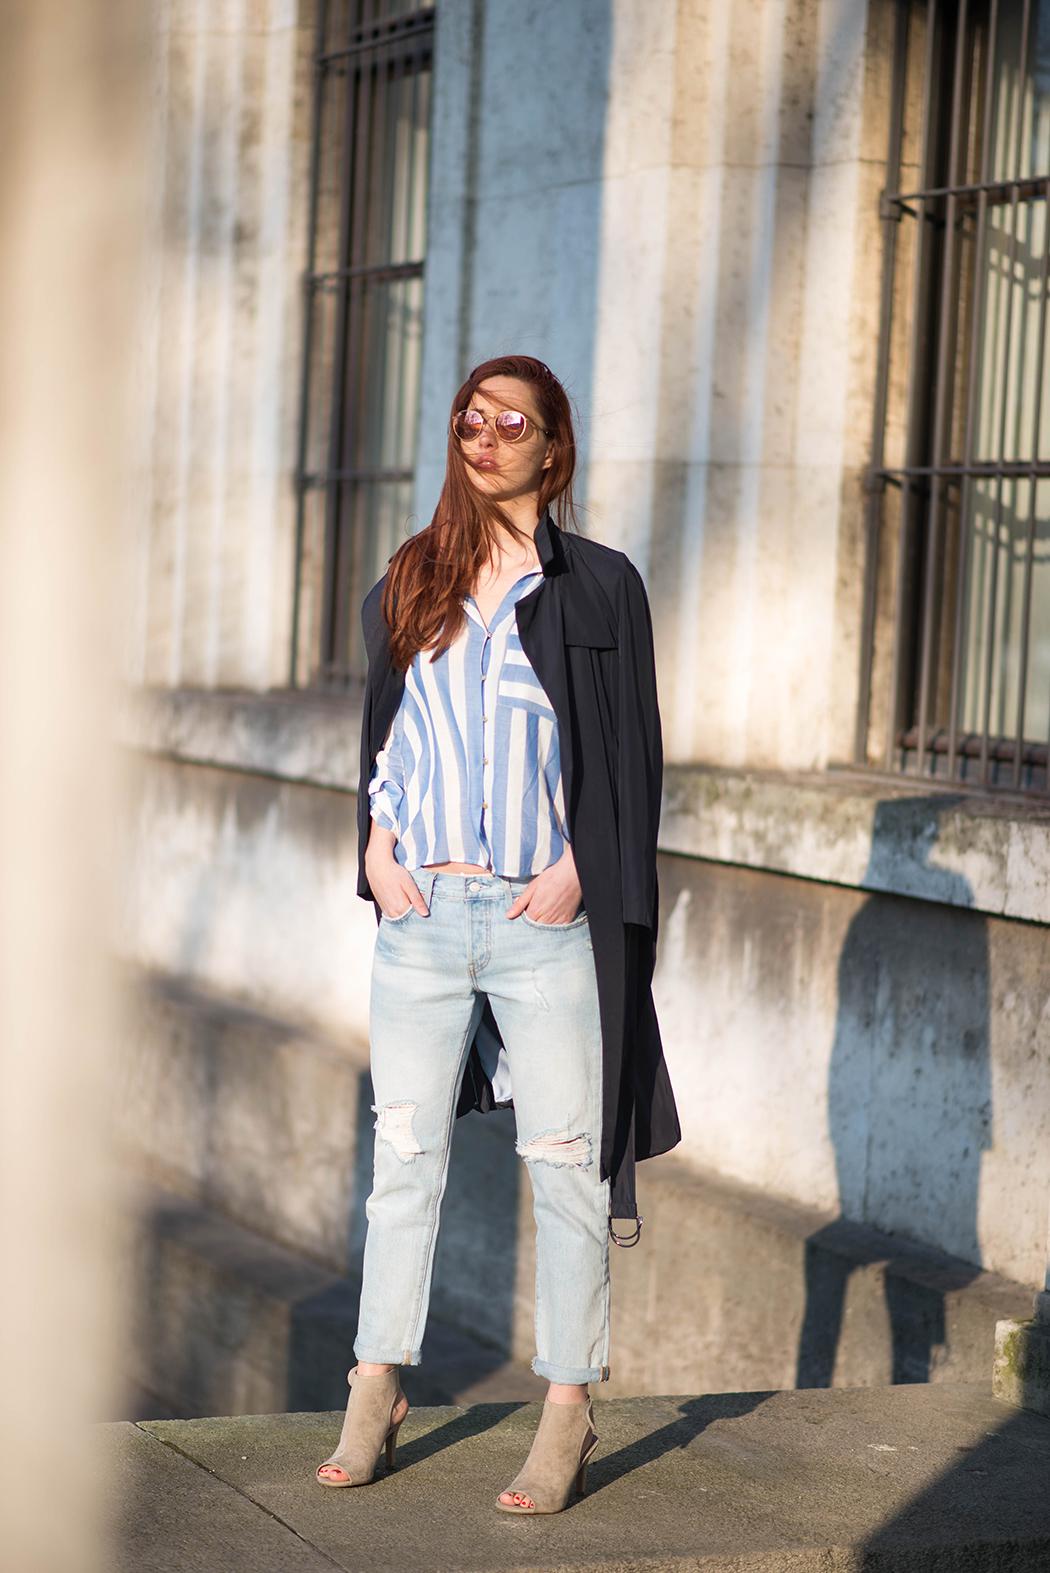 Fashionblogger-Deutschland-Fashionblog-München-Lindarella-Levis-501CT-Marinelook-Ripped-Jeans-Lindarella-10